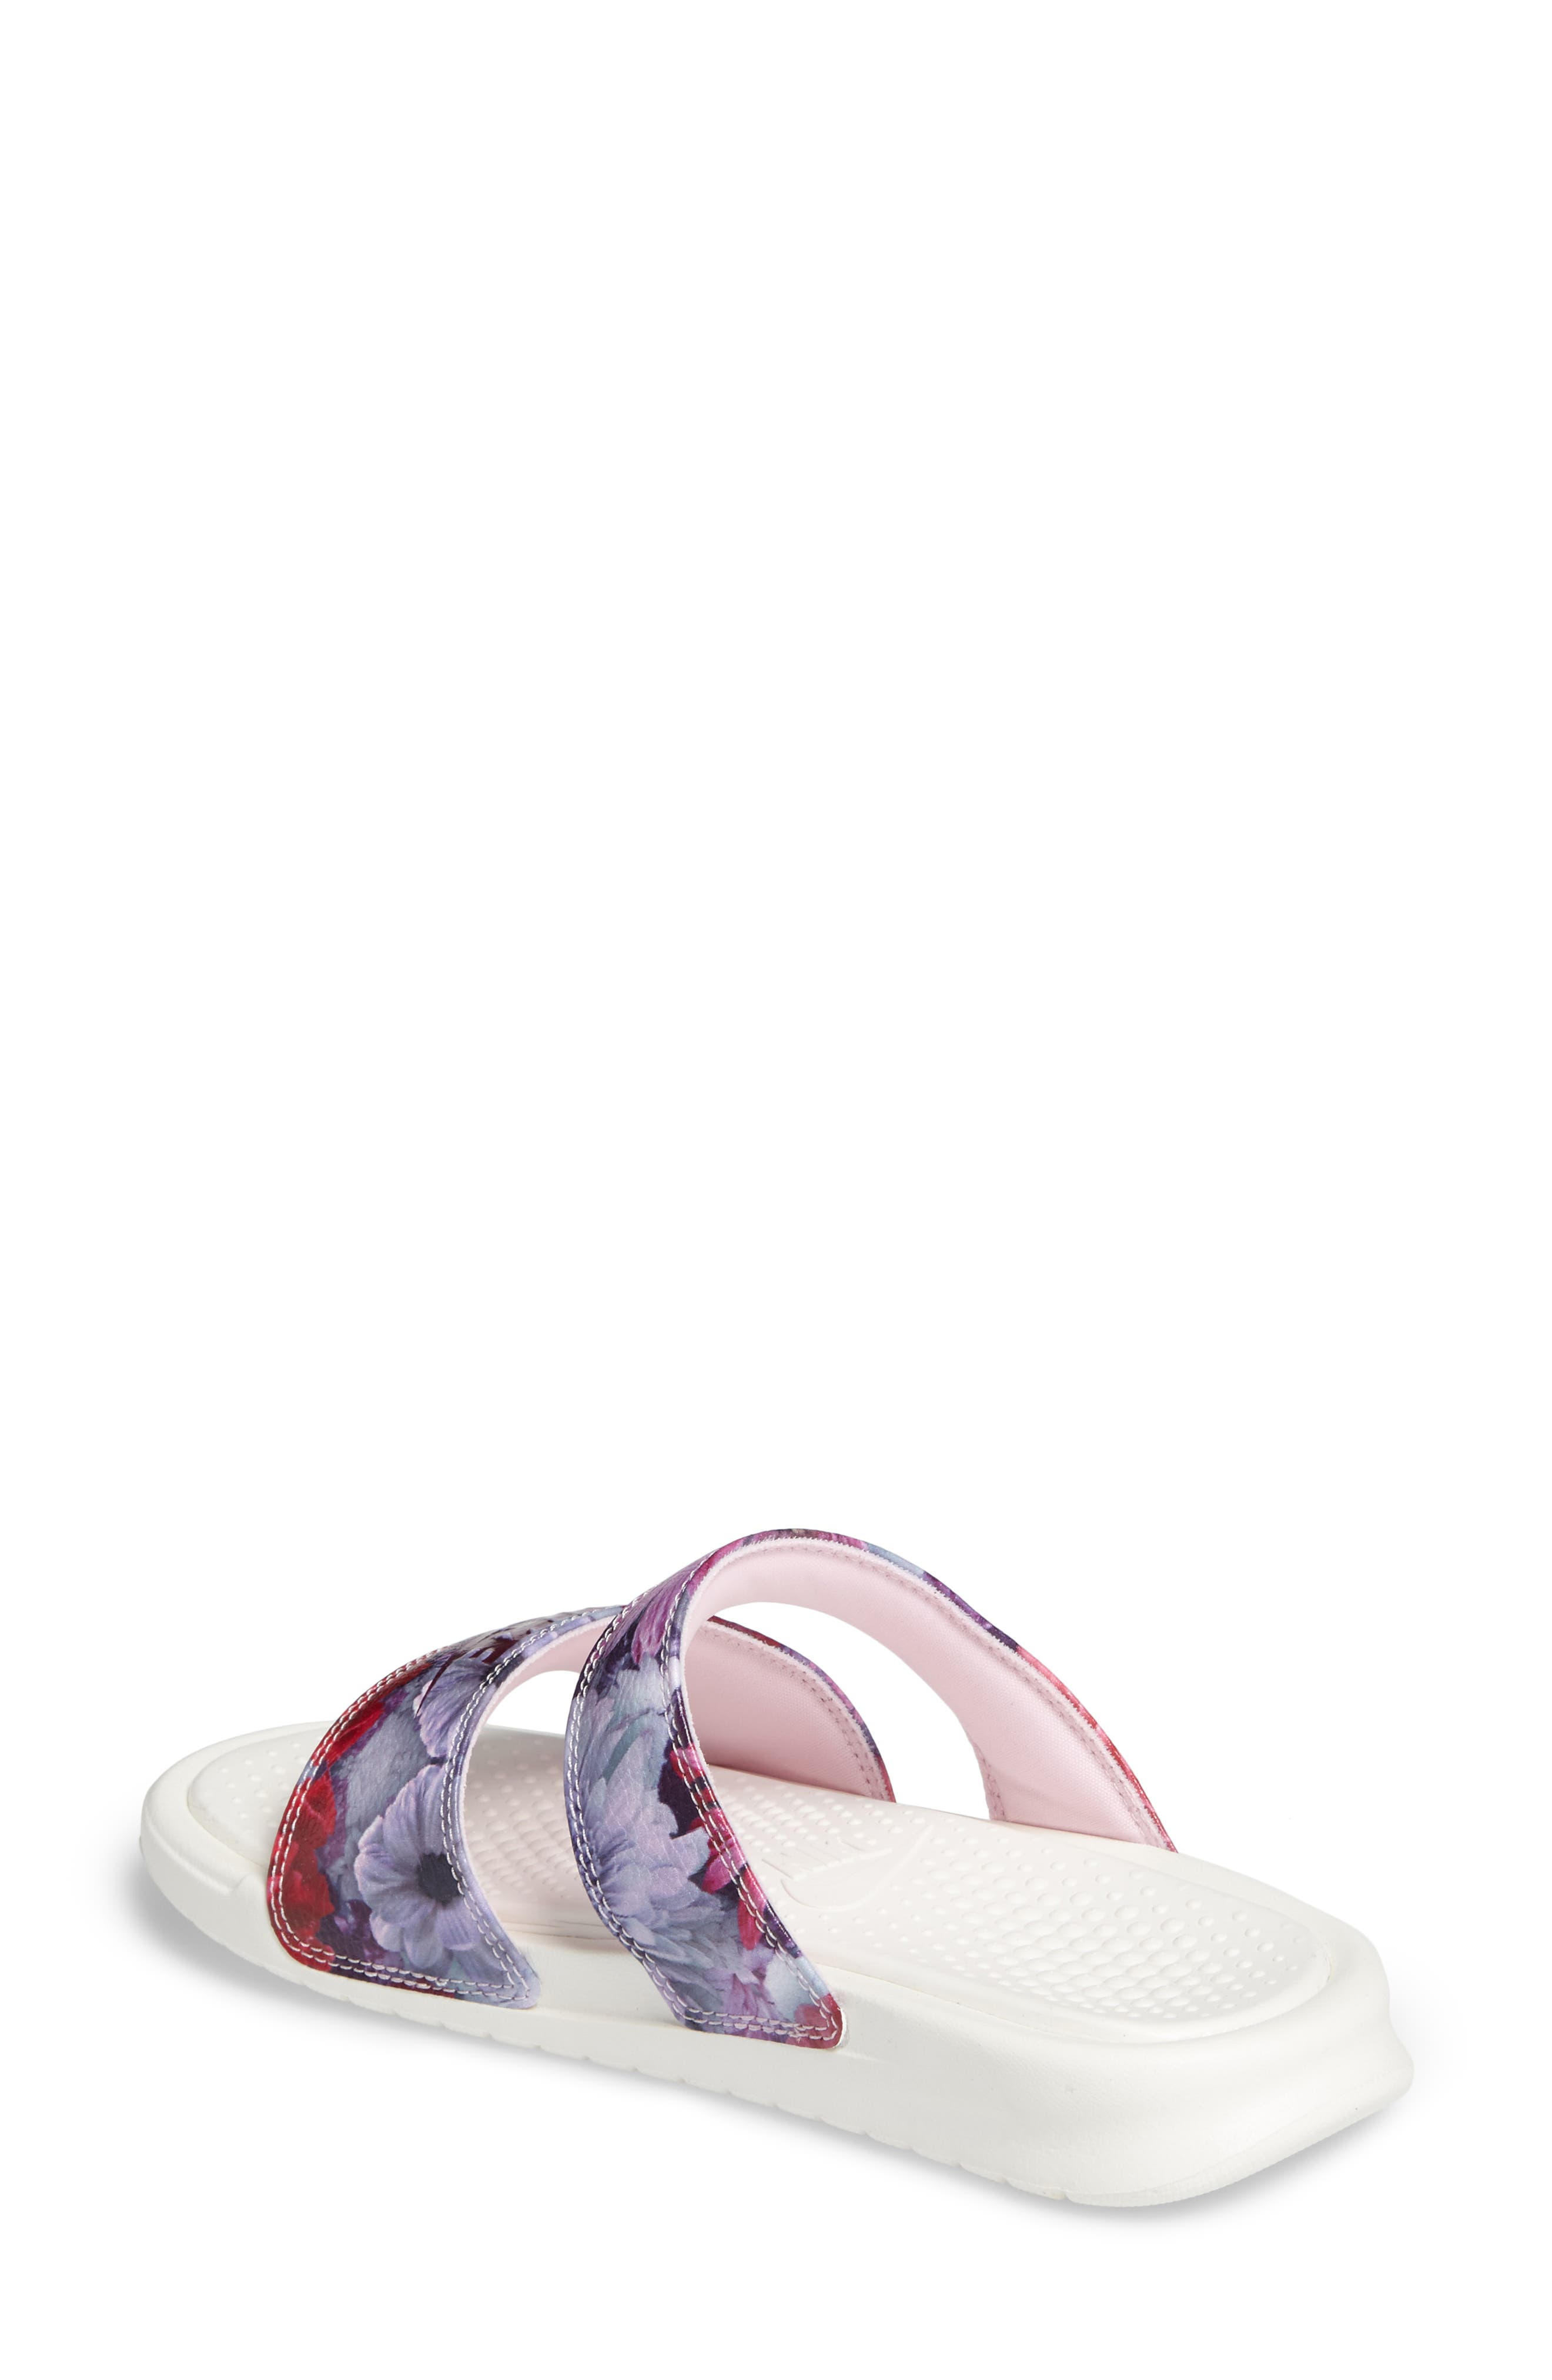 Alternate Image 2  - Nike Benassi Duo Ultra Slide Sandal (Women)